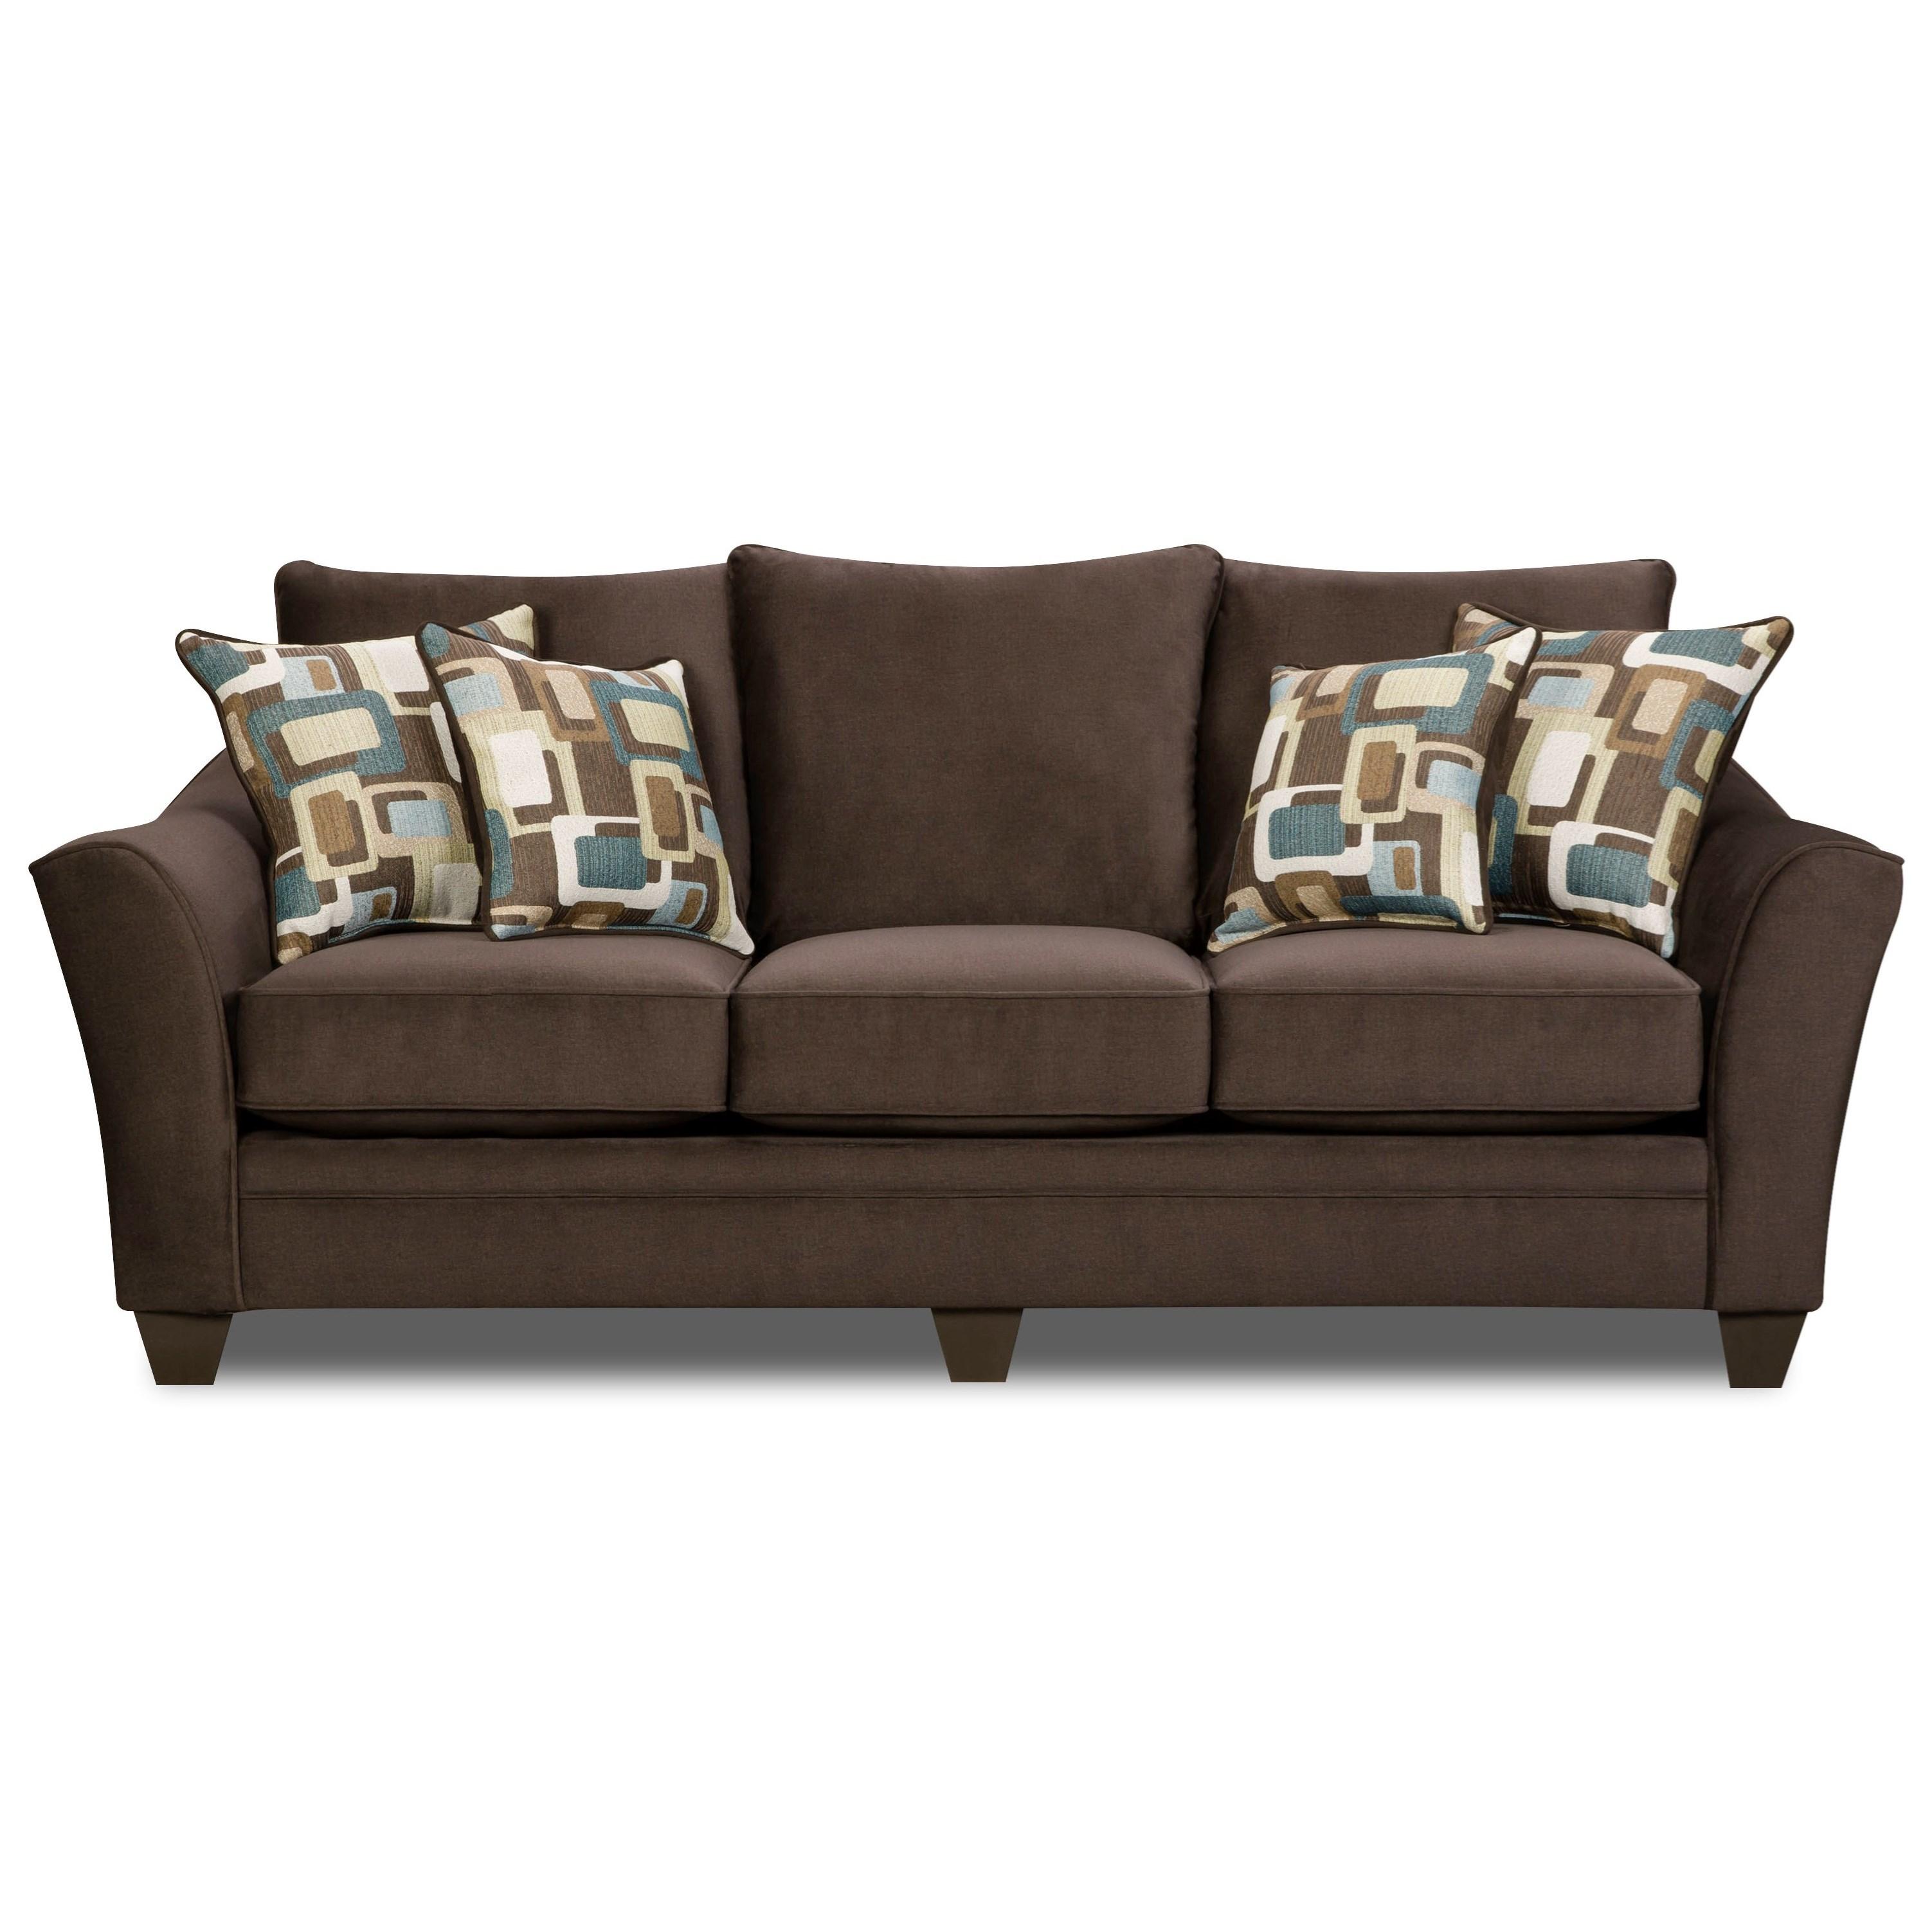 Miskelly Furniture Bbq West Palm Beach